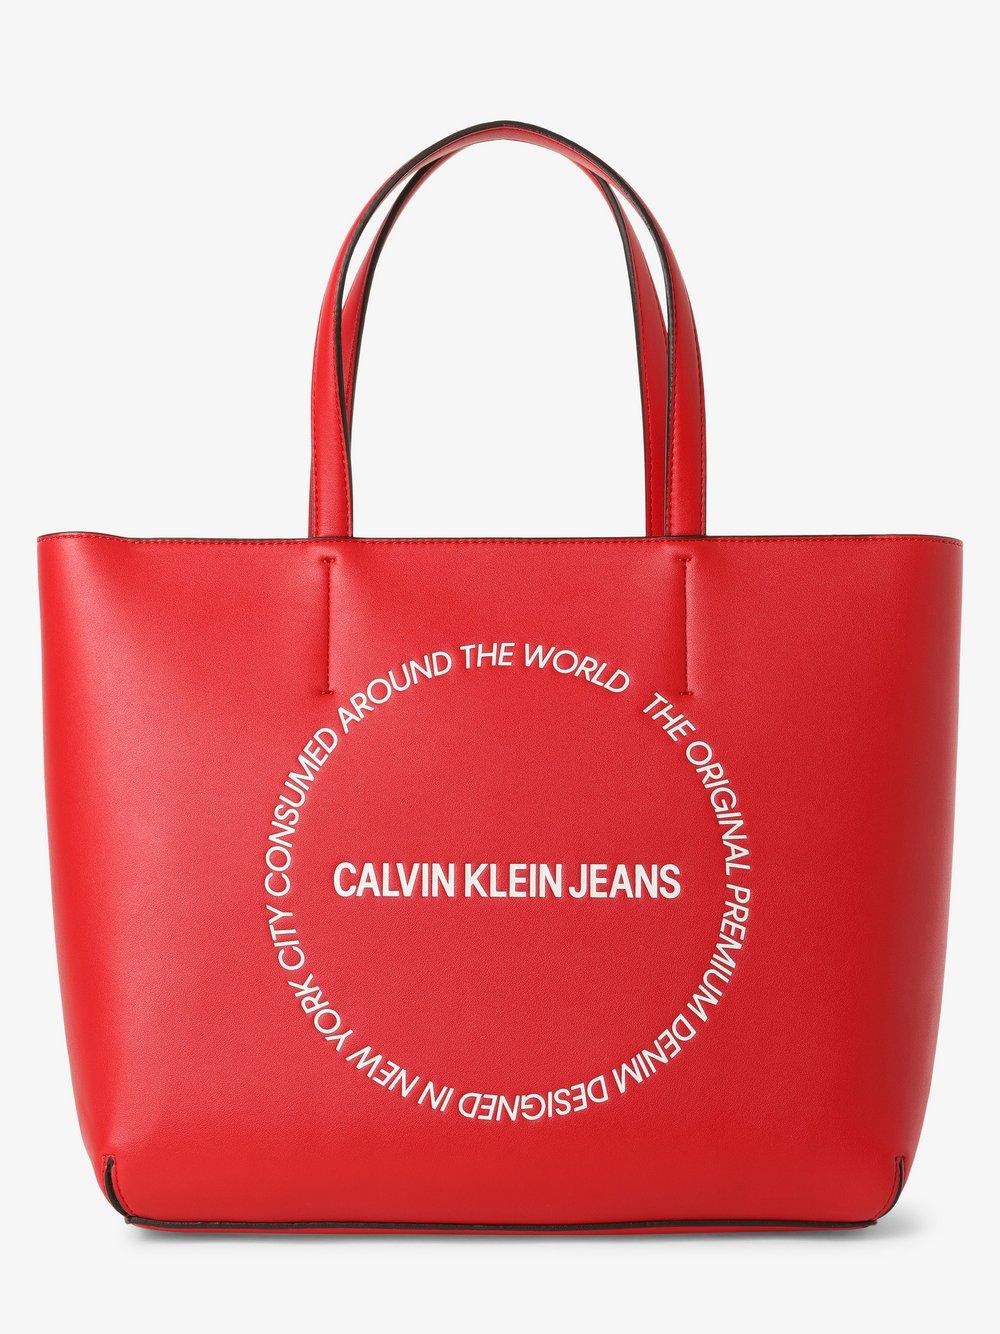 Calvin Klein Jeans - Damska torba shopper, czerwony